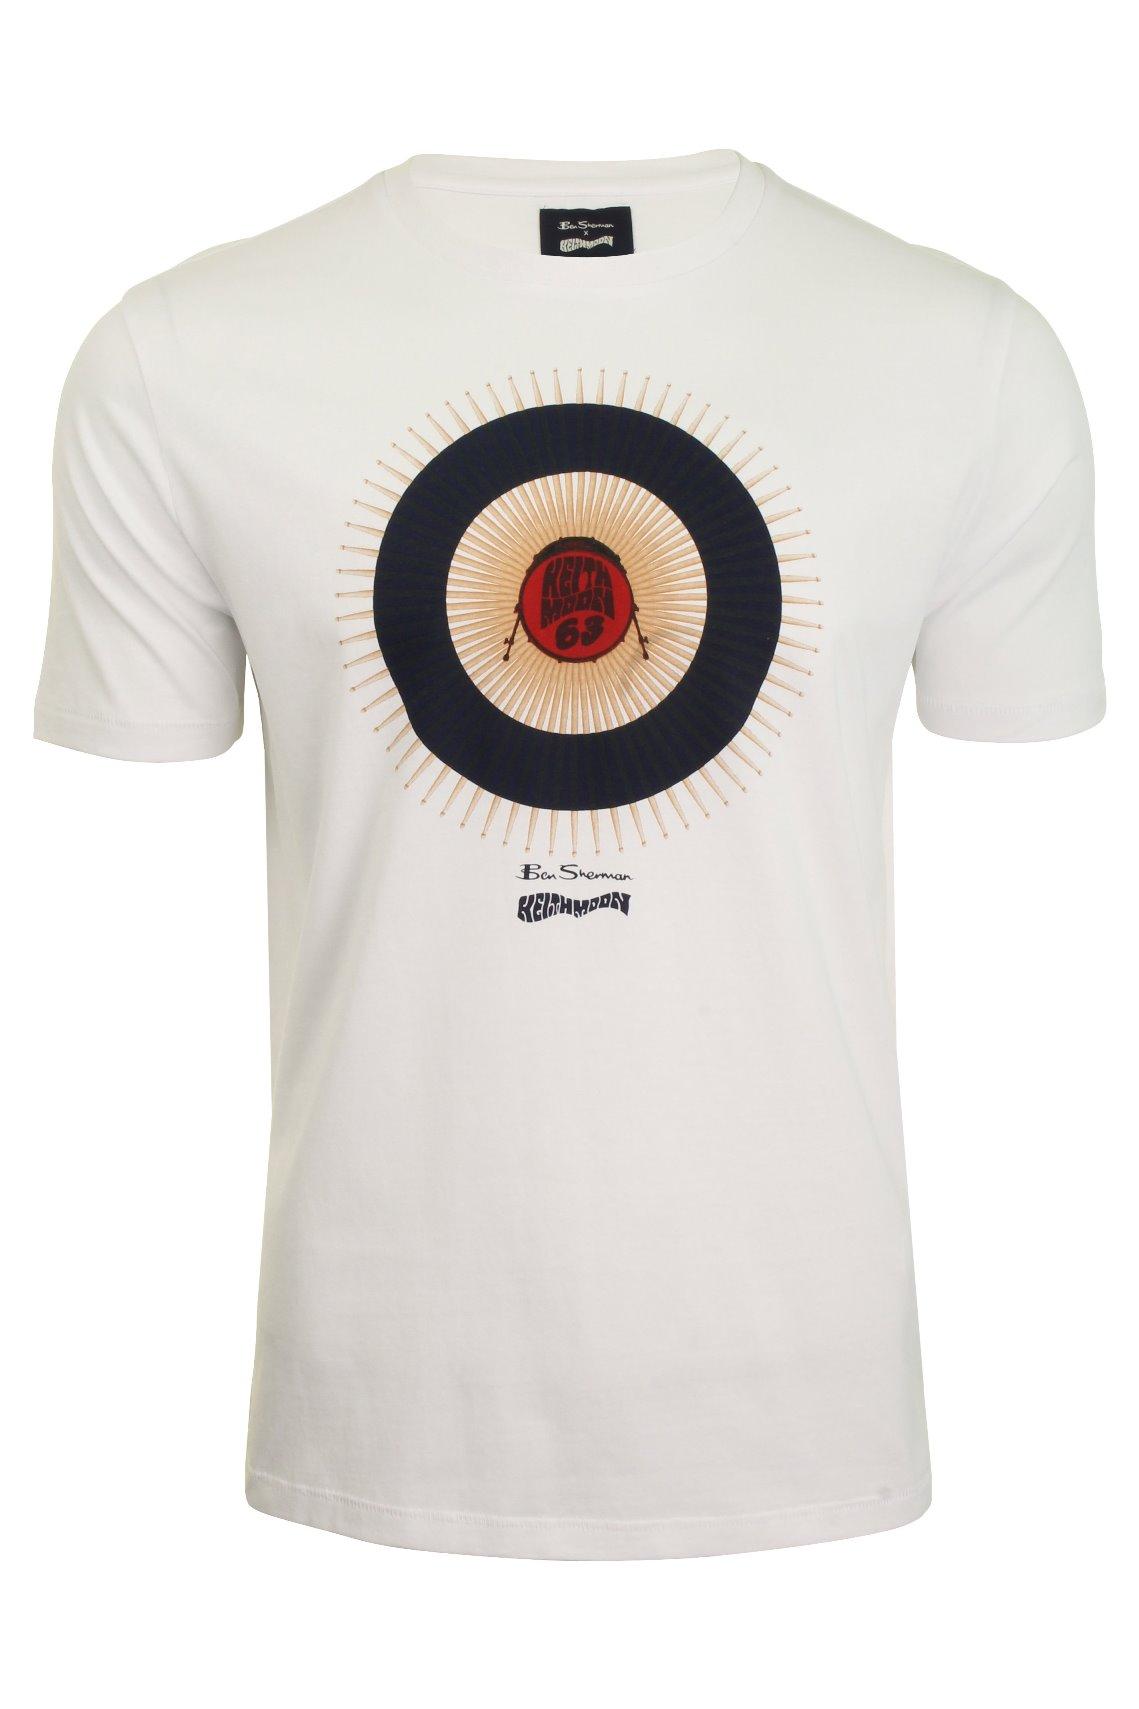 Small Ben Sherman Target T-shirt Grey